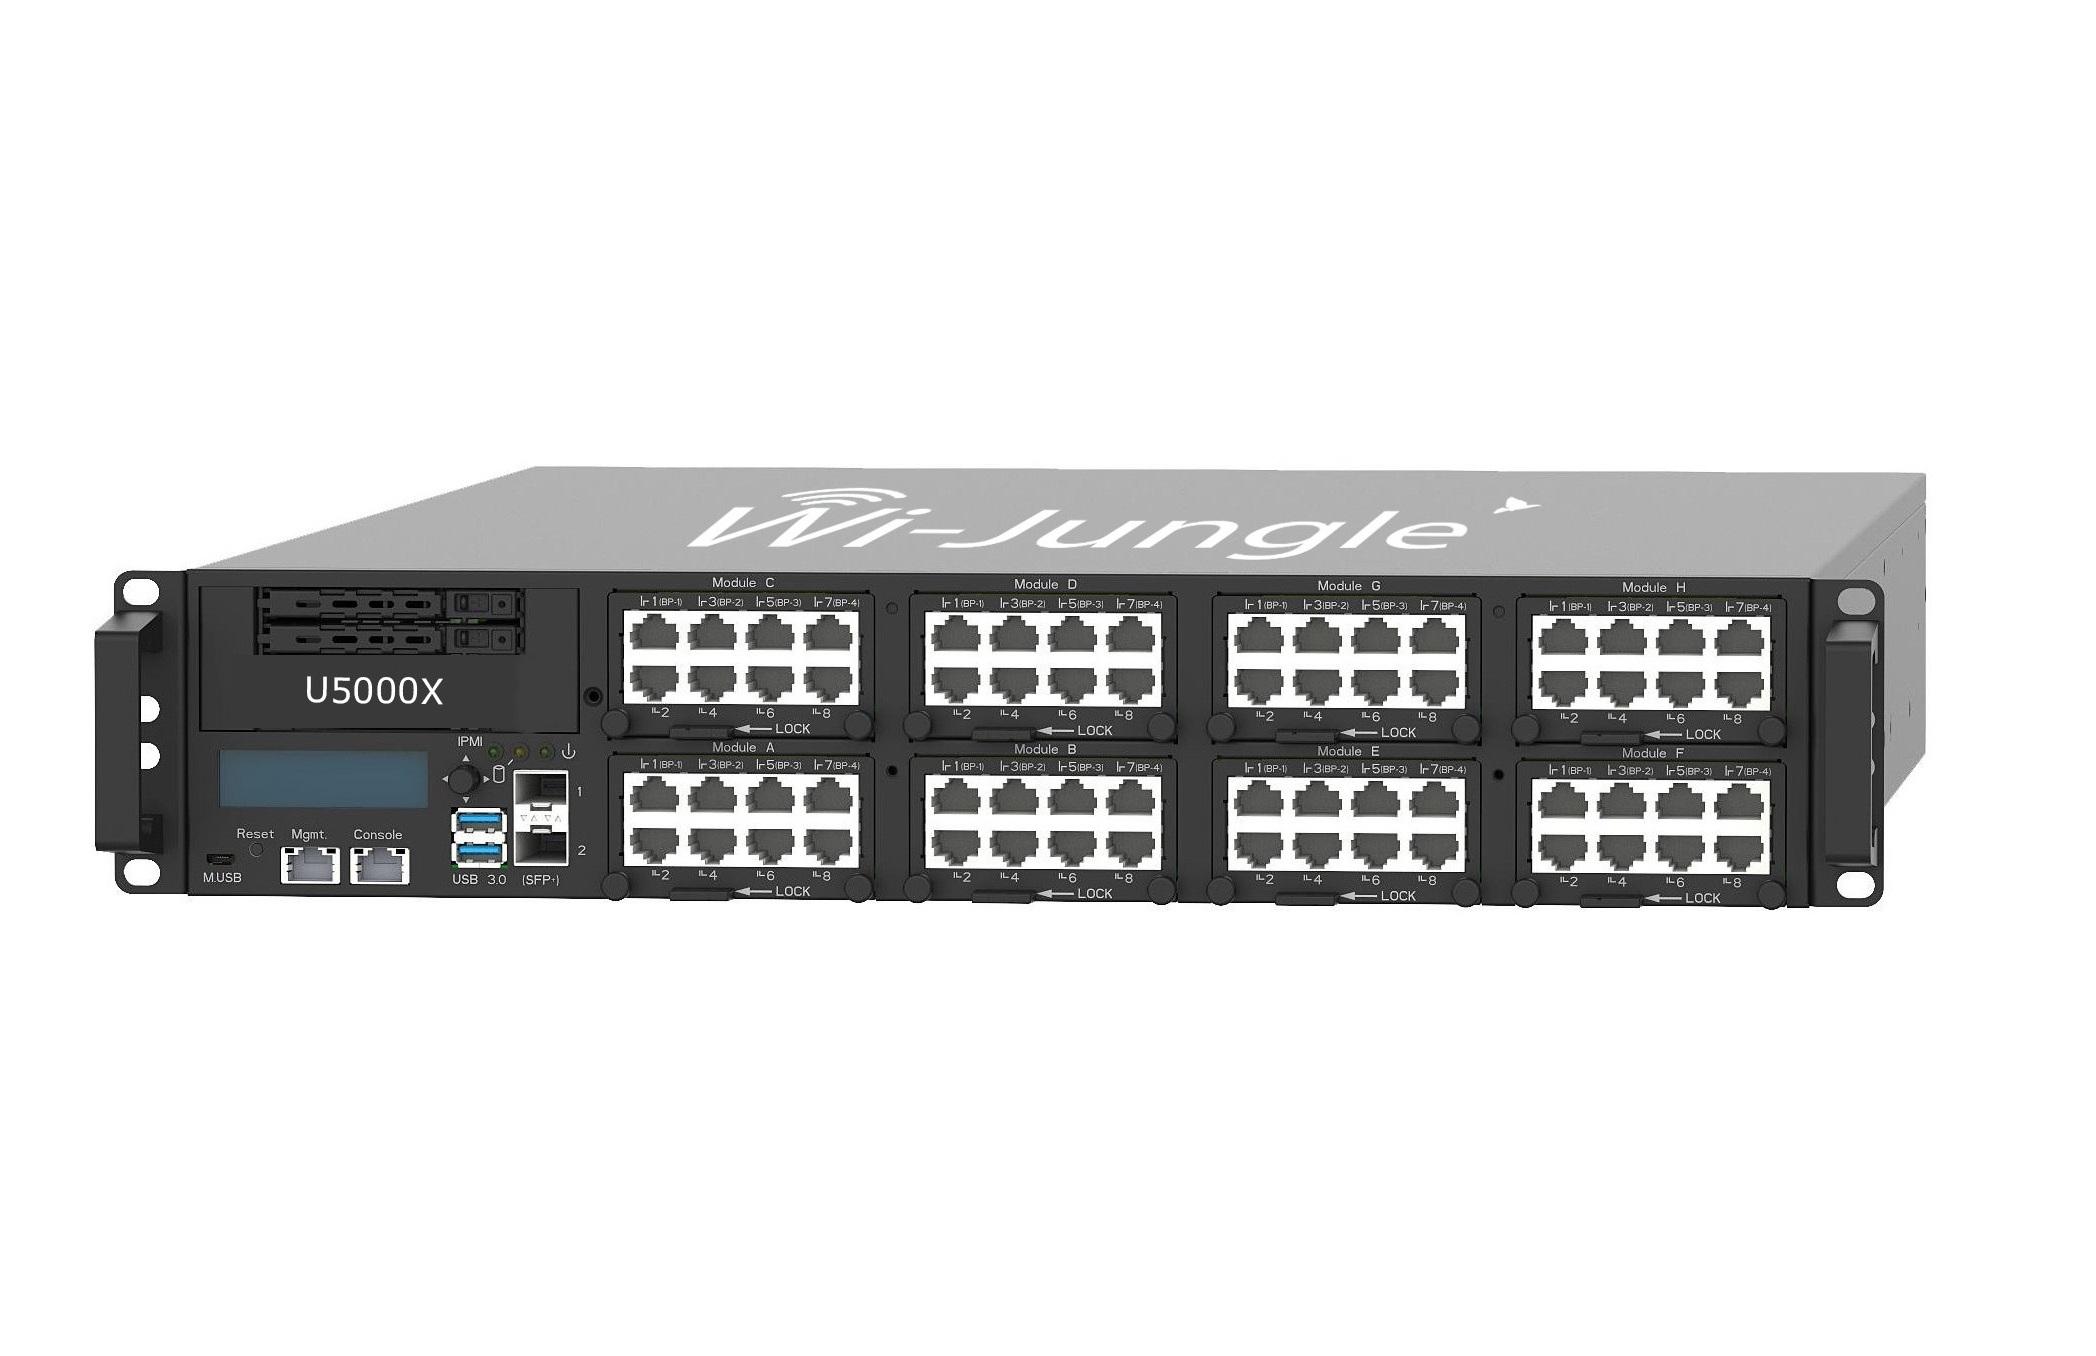 WiJungle Unified Network Security Gateway (NextGen Firewall/UTM + Web Application Firewall + Hotspot Gateway + Load Balancer Router + VPN Router) With 3 Years License